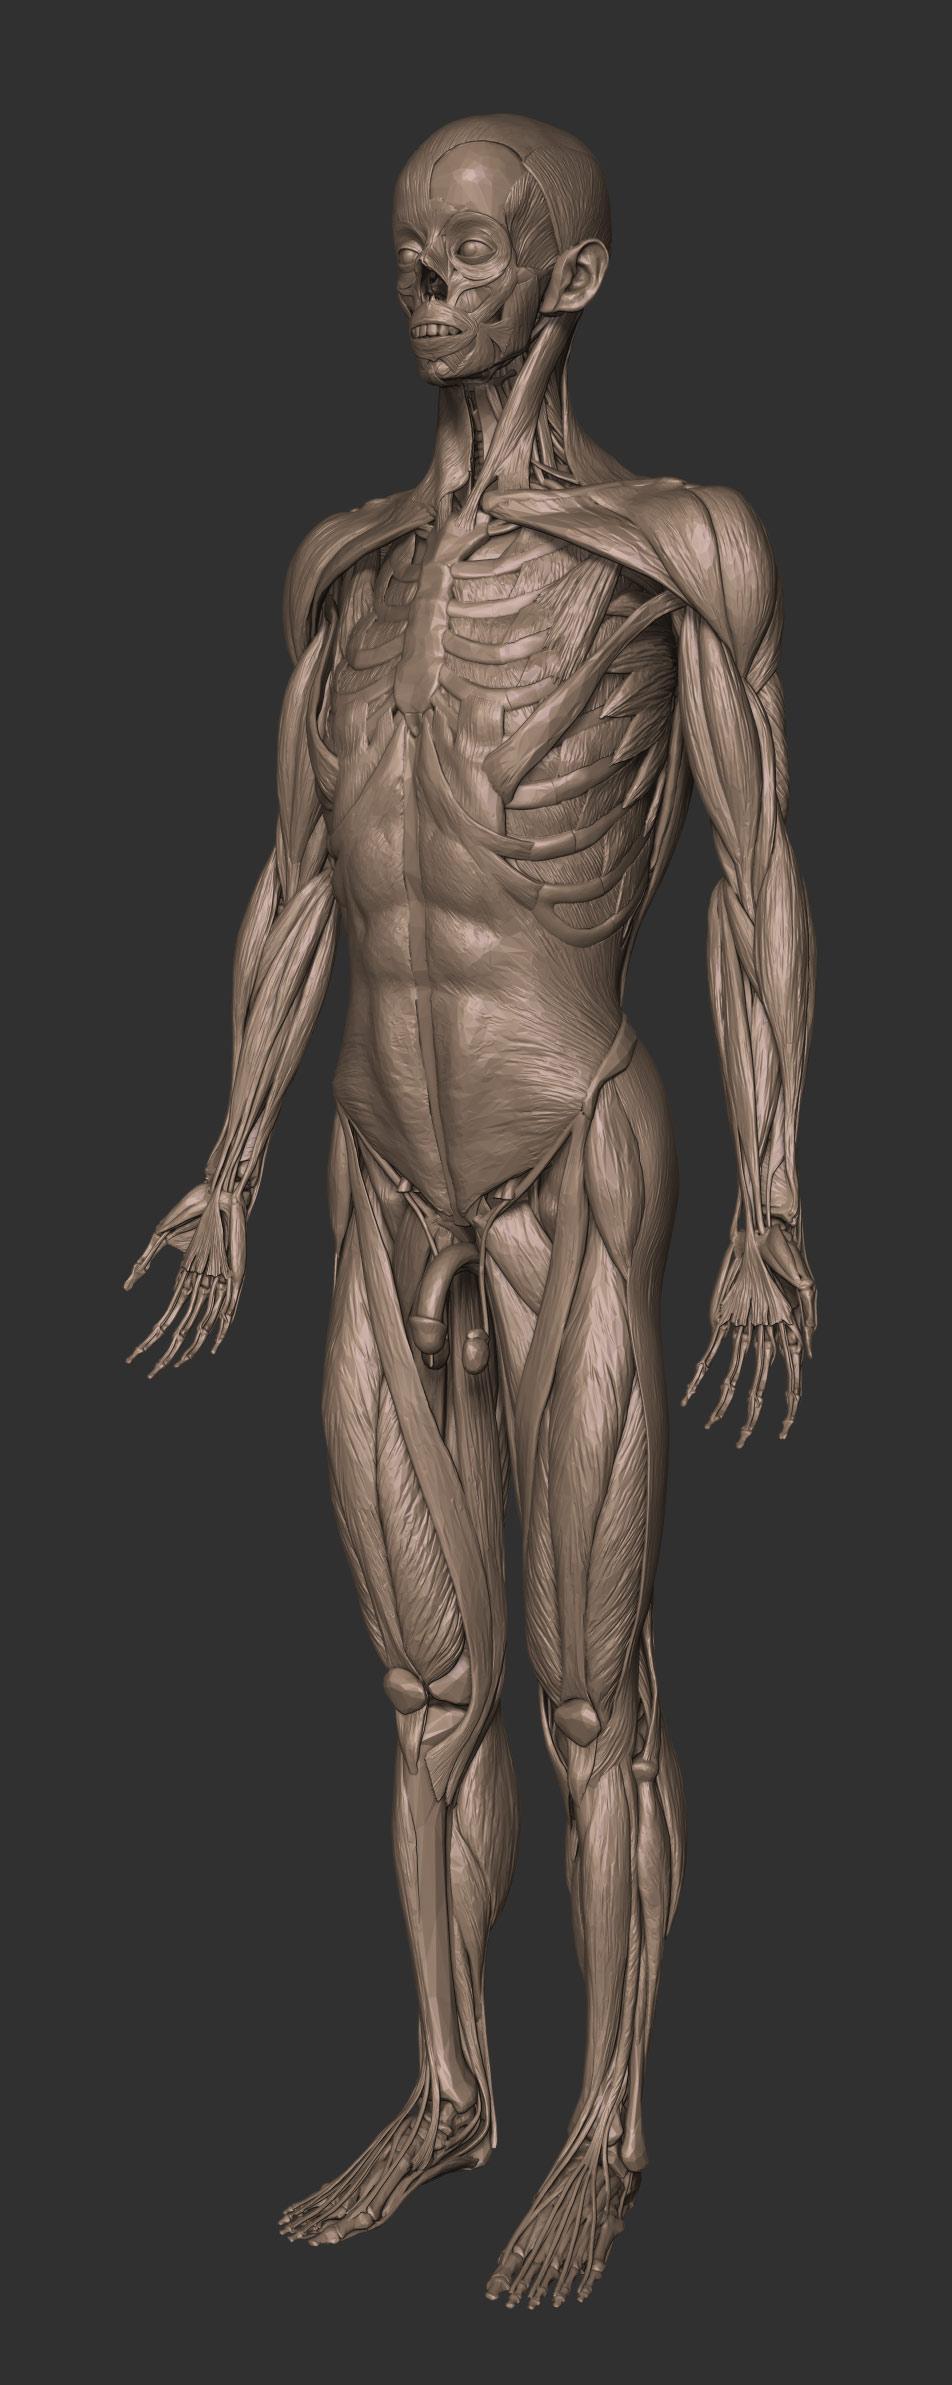 Full anatomy model free download